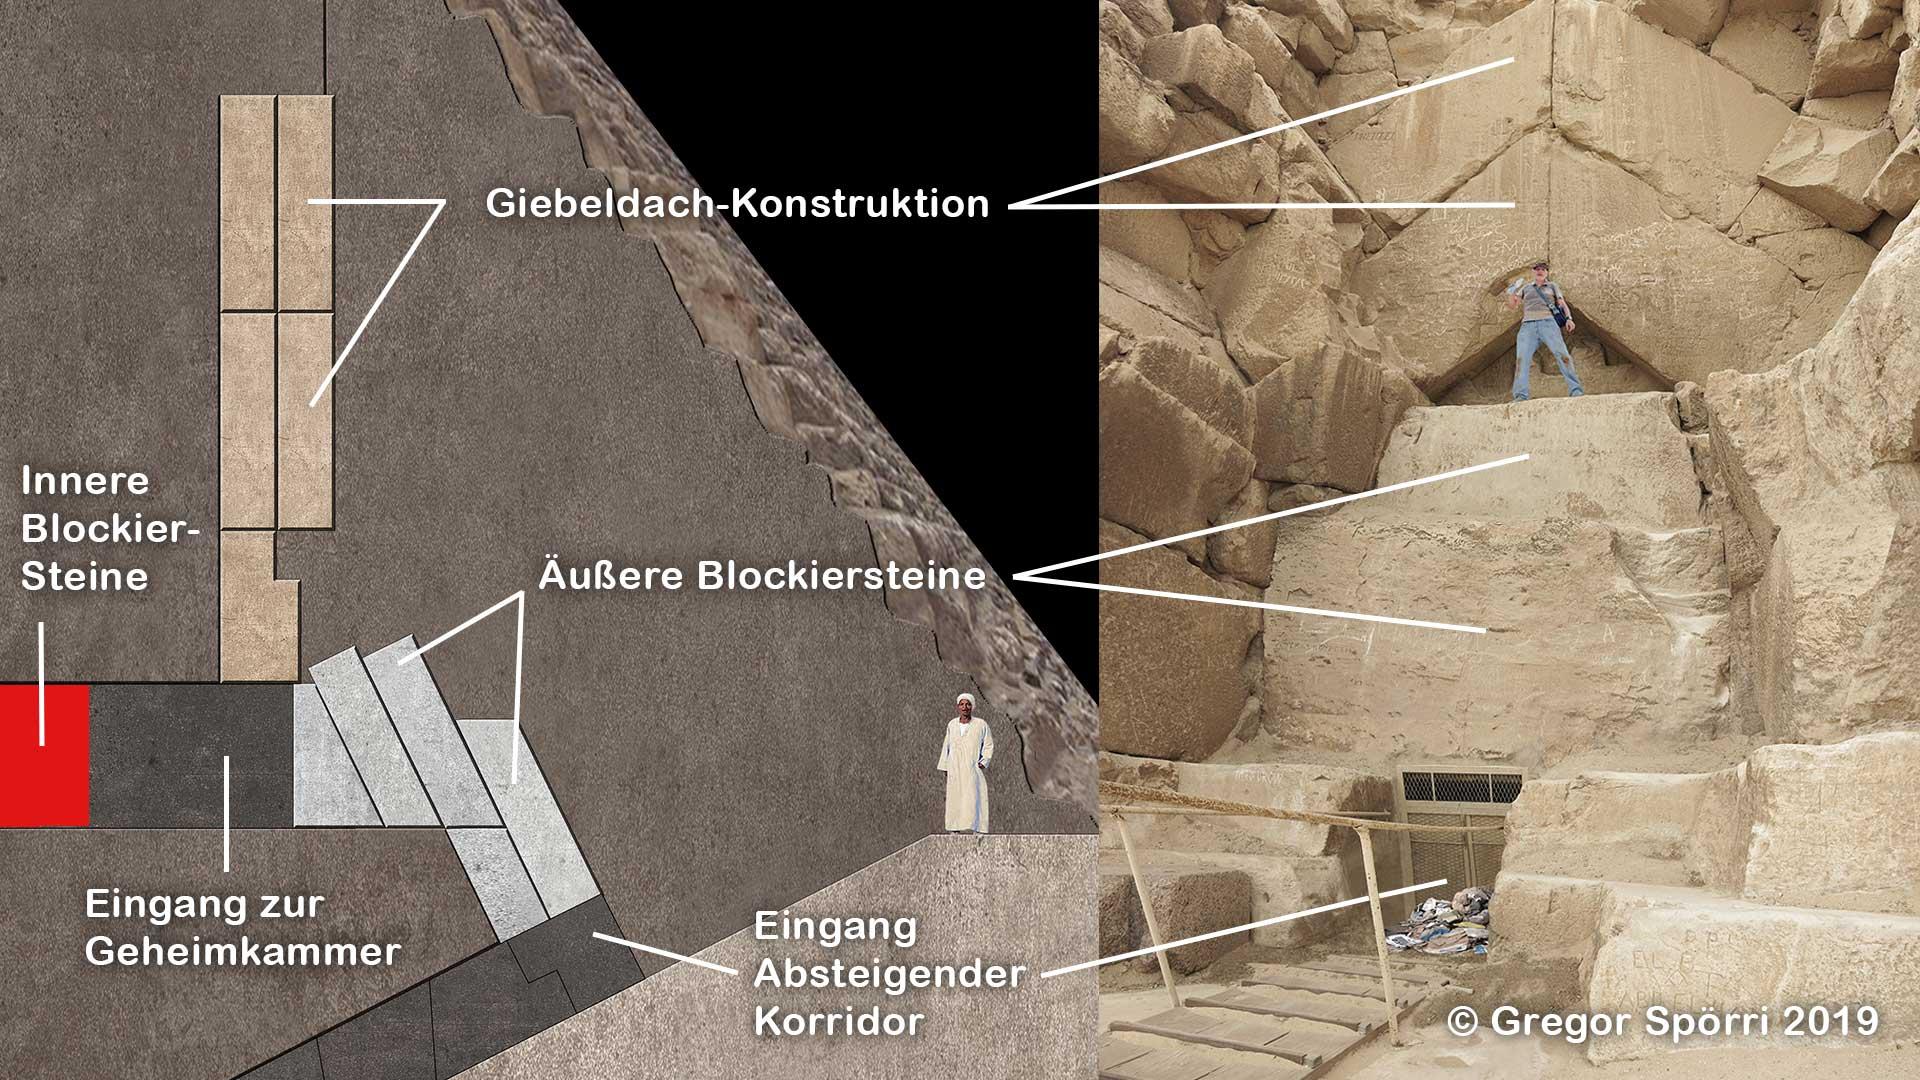 Cheops-Pyramide: Geheime Kammer hinter dem Original-Eingang.